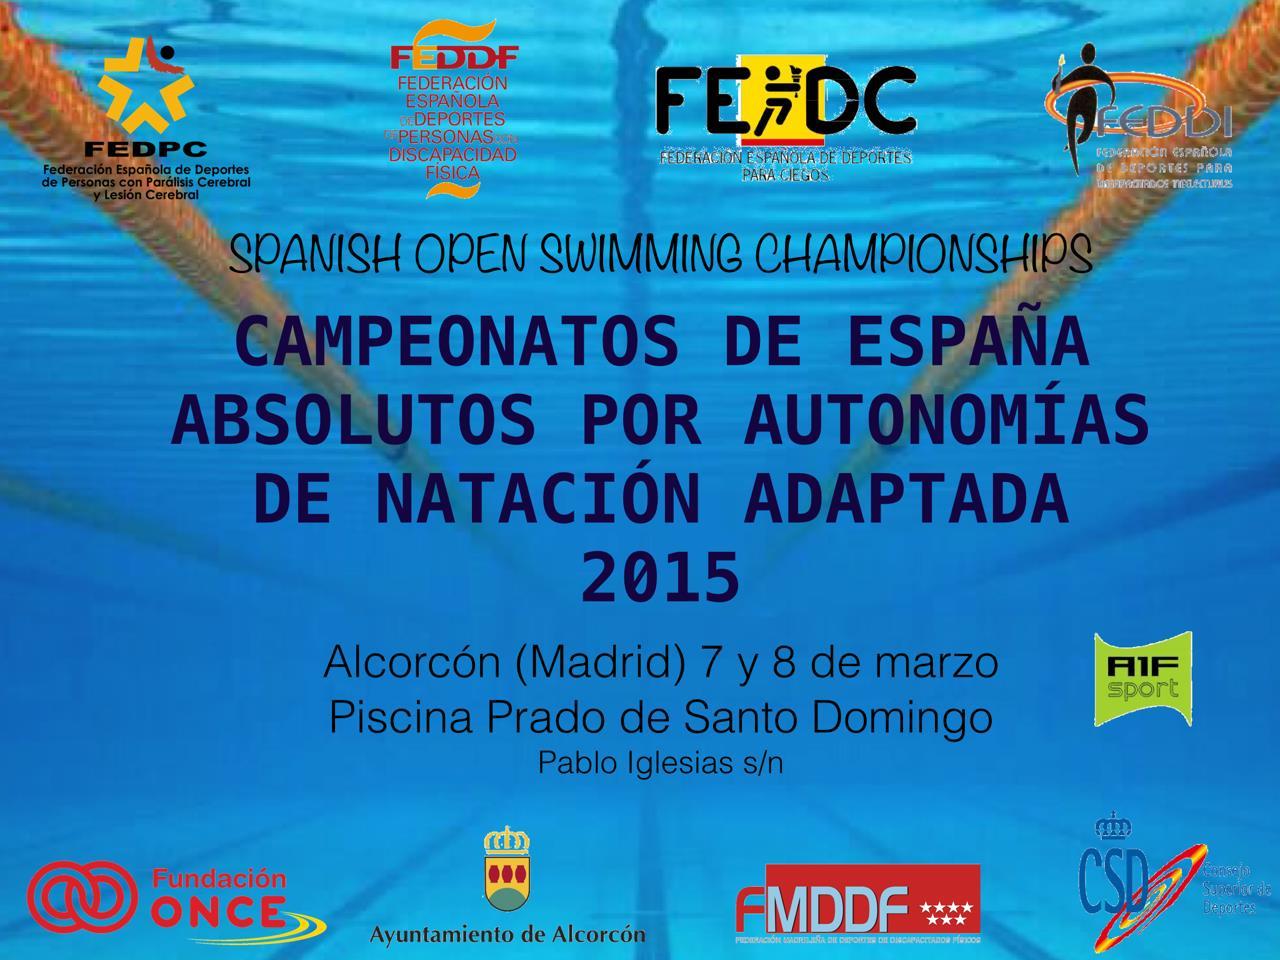 Este fin de semana se celebran en Madrid los Campeonatos de España absolutos por autonomías de natación adaptada 2015